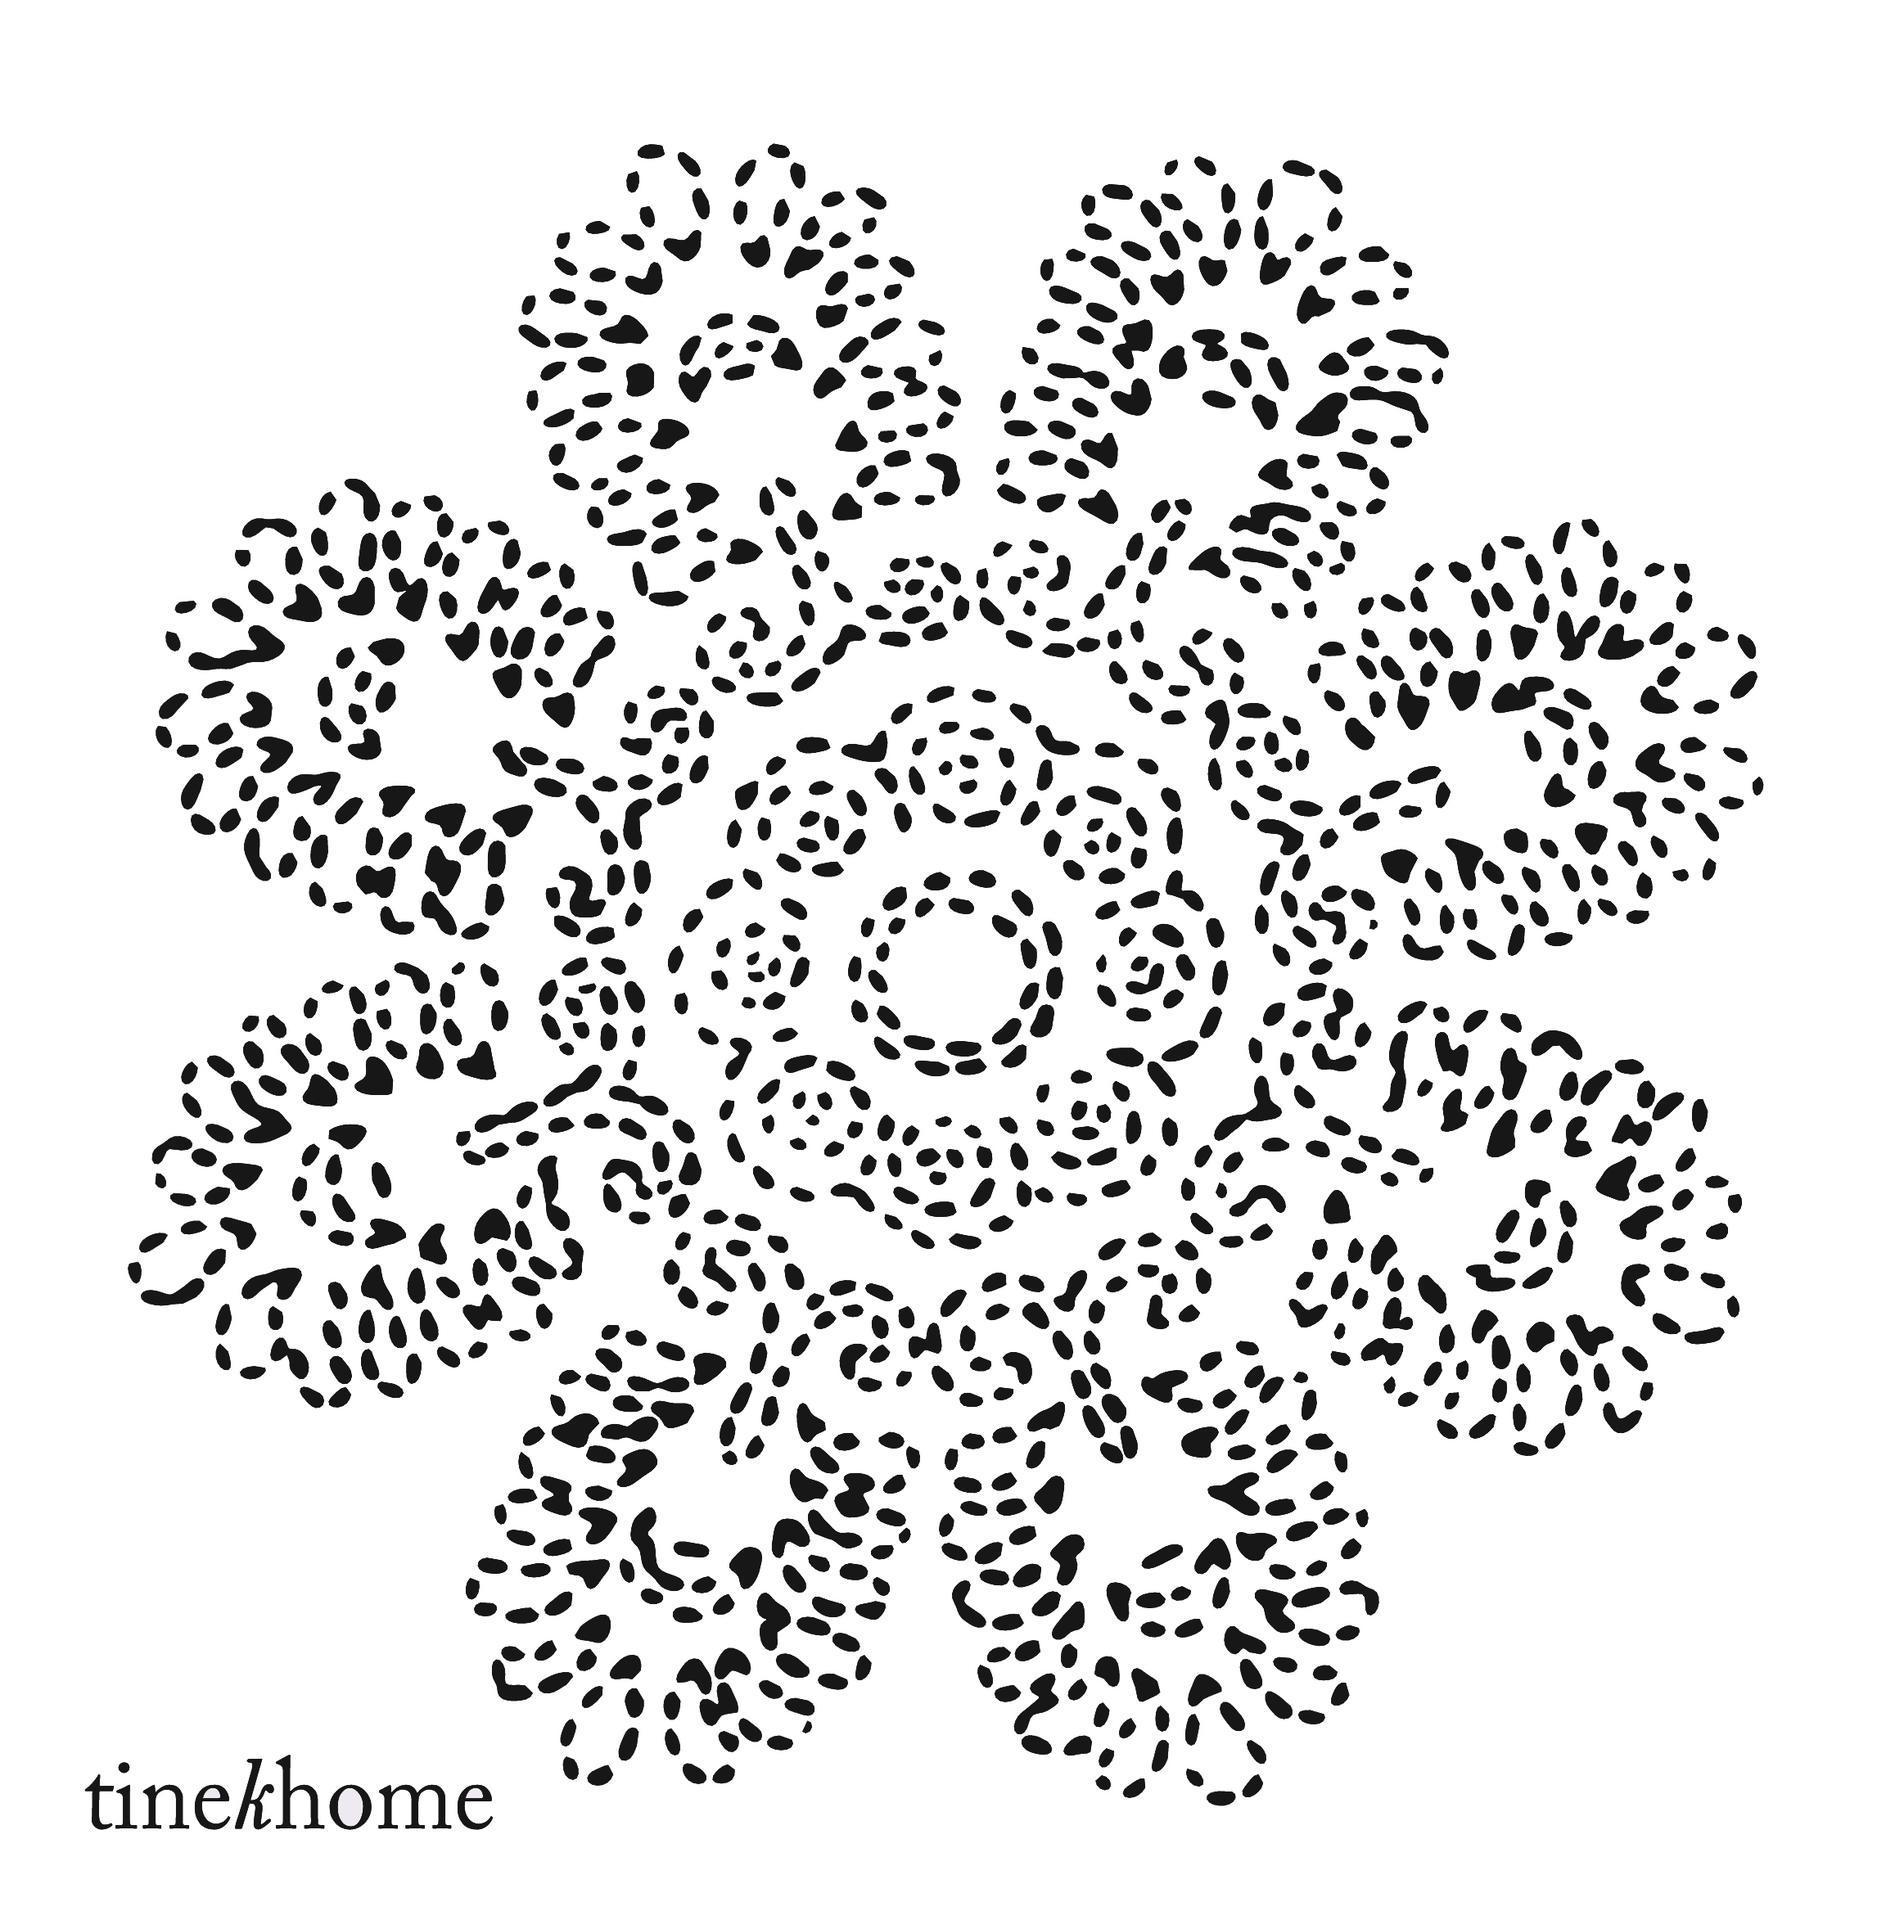 tineKhome Papírové ubrousky Lotus flower - 50 ks, černá barva, bílá barva, papír